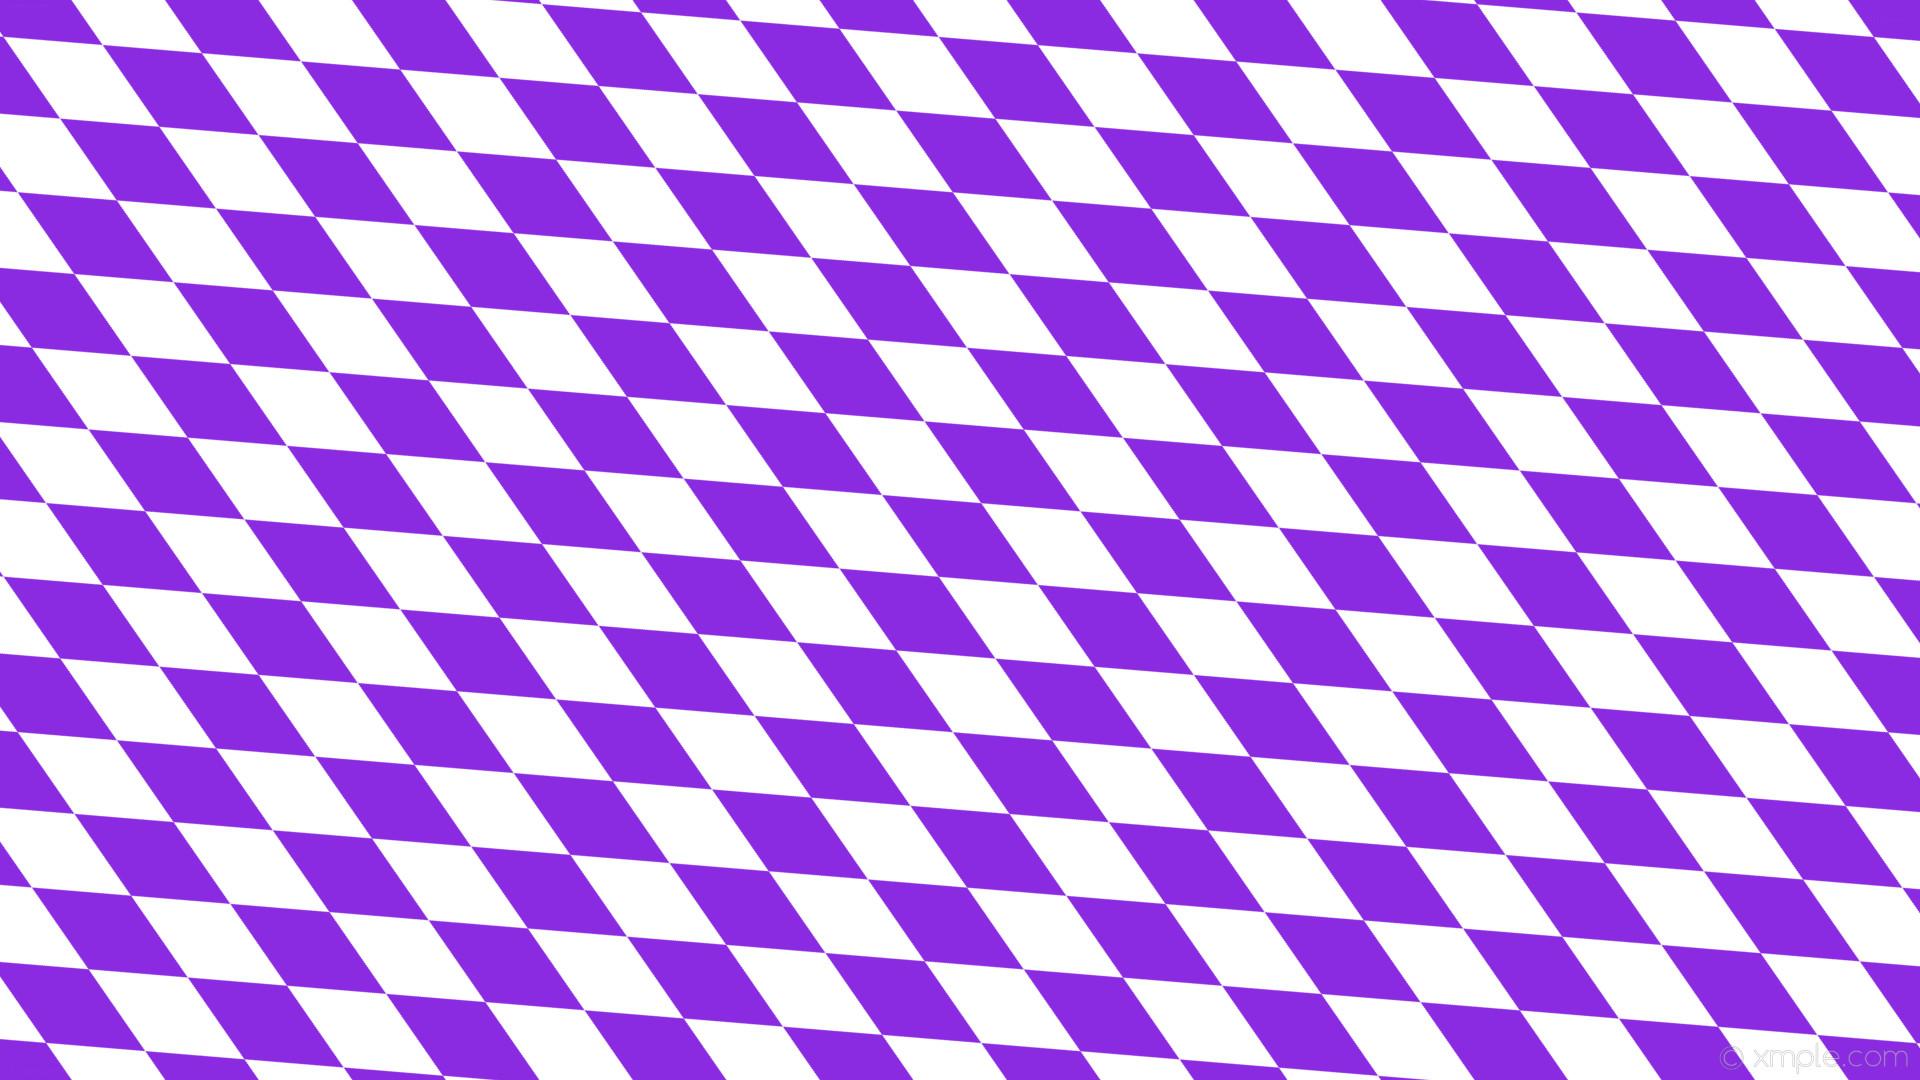 wallpaper rhombus lozenge white purple diamond blue violet #8a2be2 #ffffff  150° 180px 85px